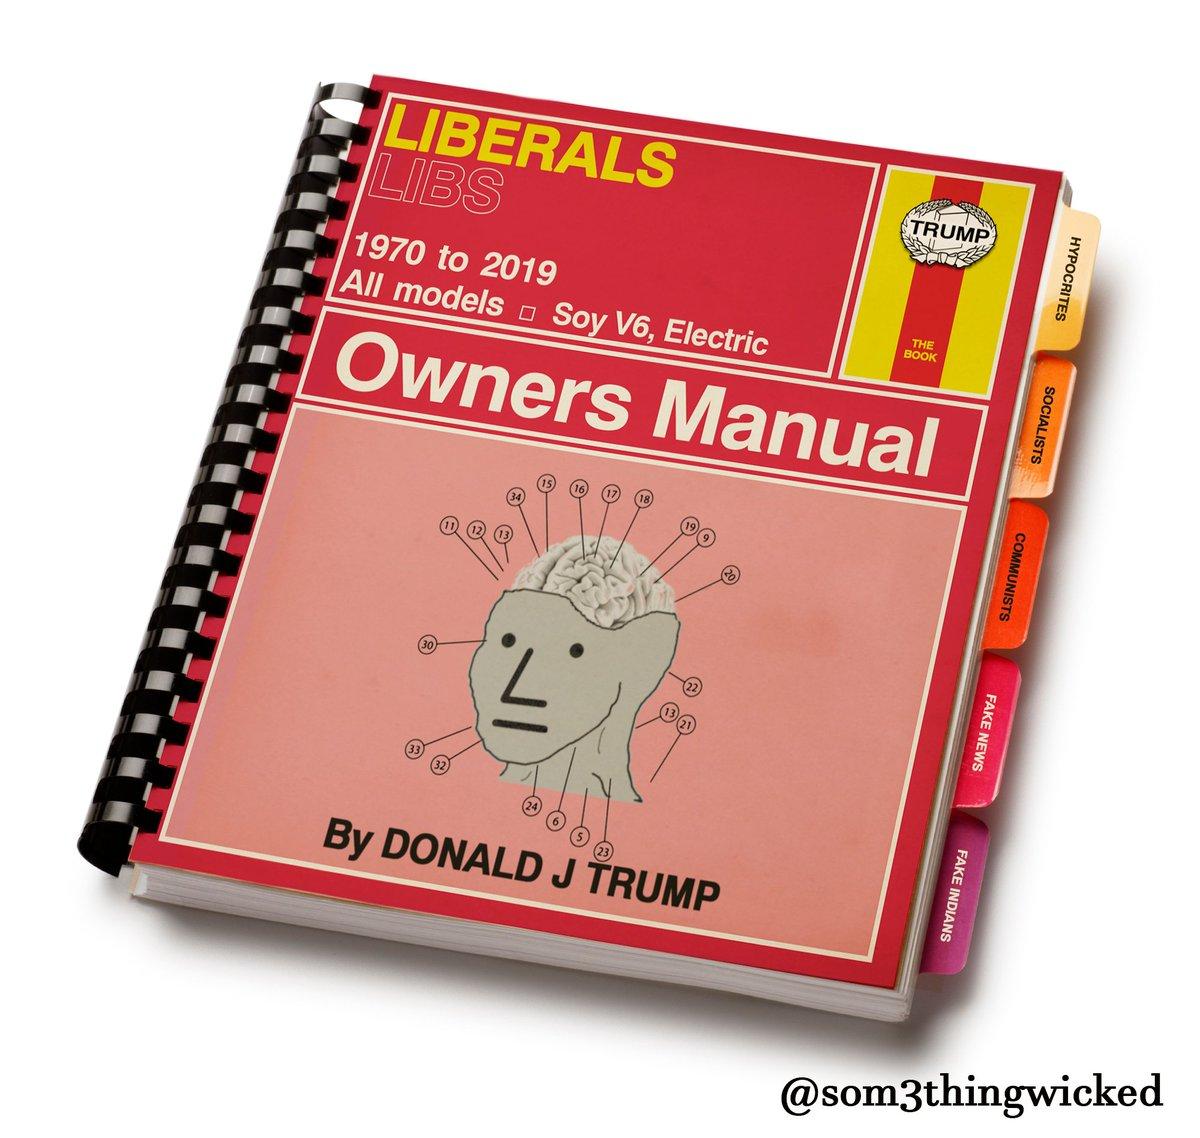 @TrumpWarRoom POTUS already owns the libs. He may break Antitrust law once he owns CNN, too.